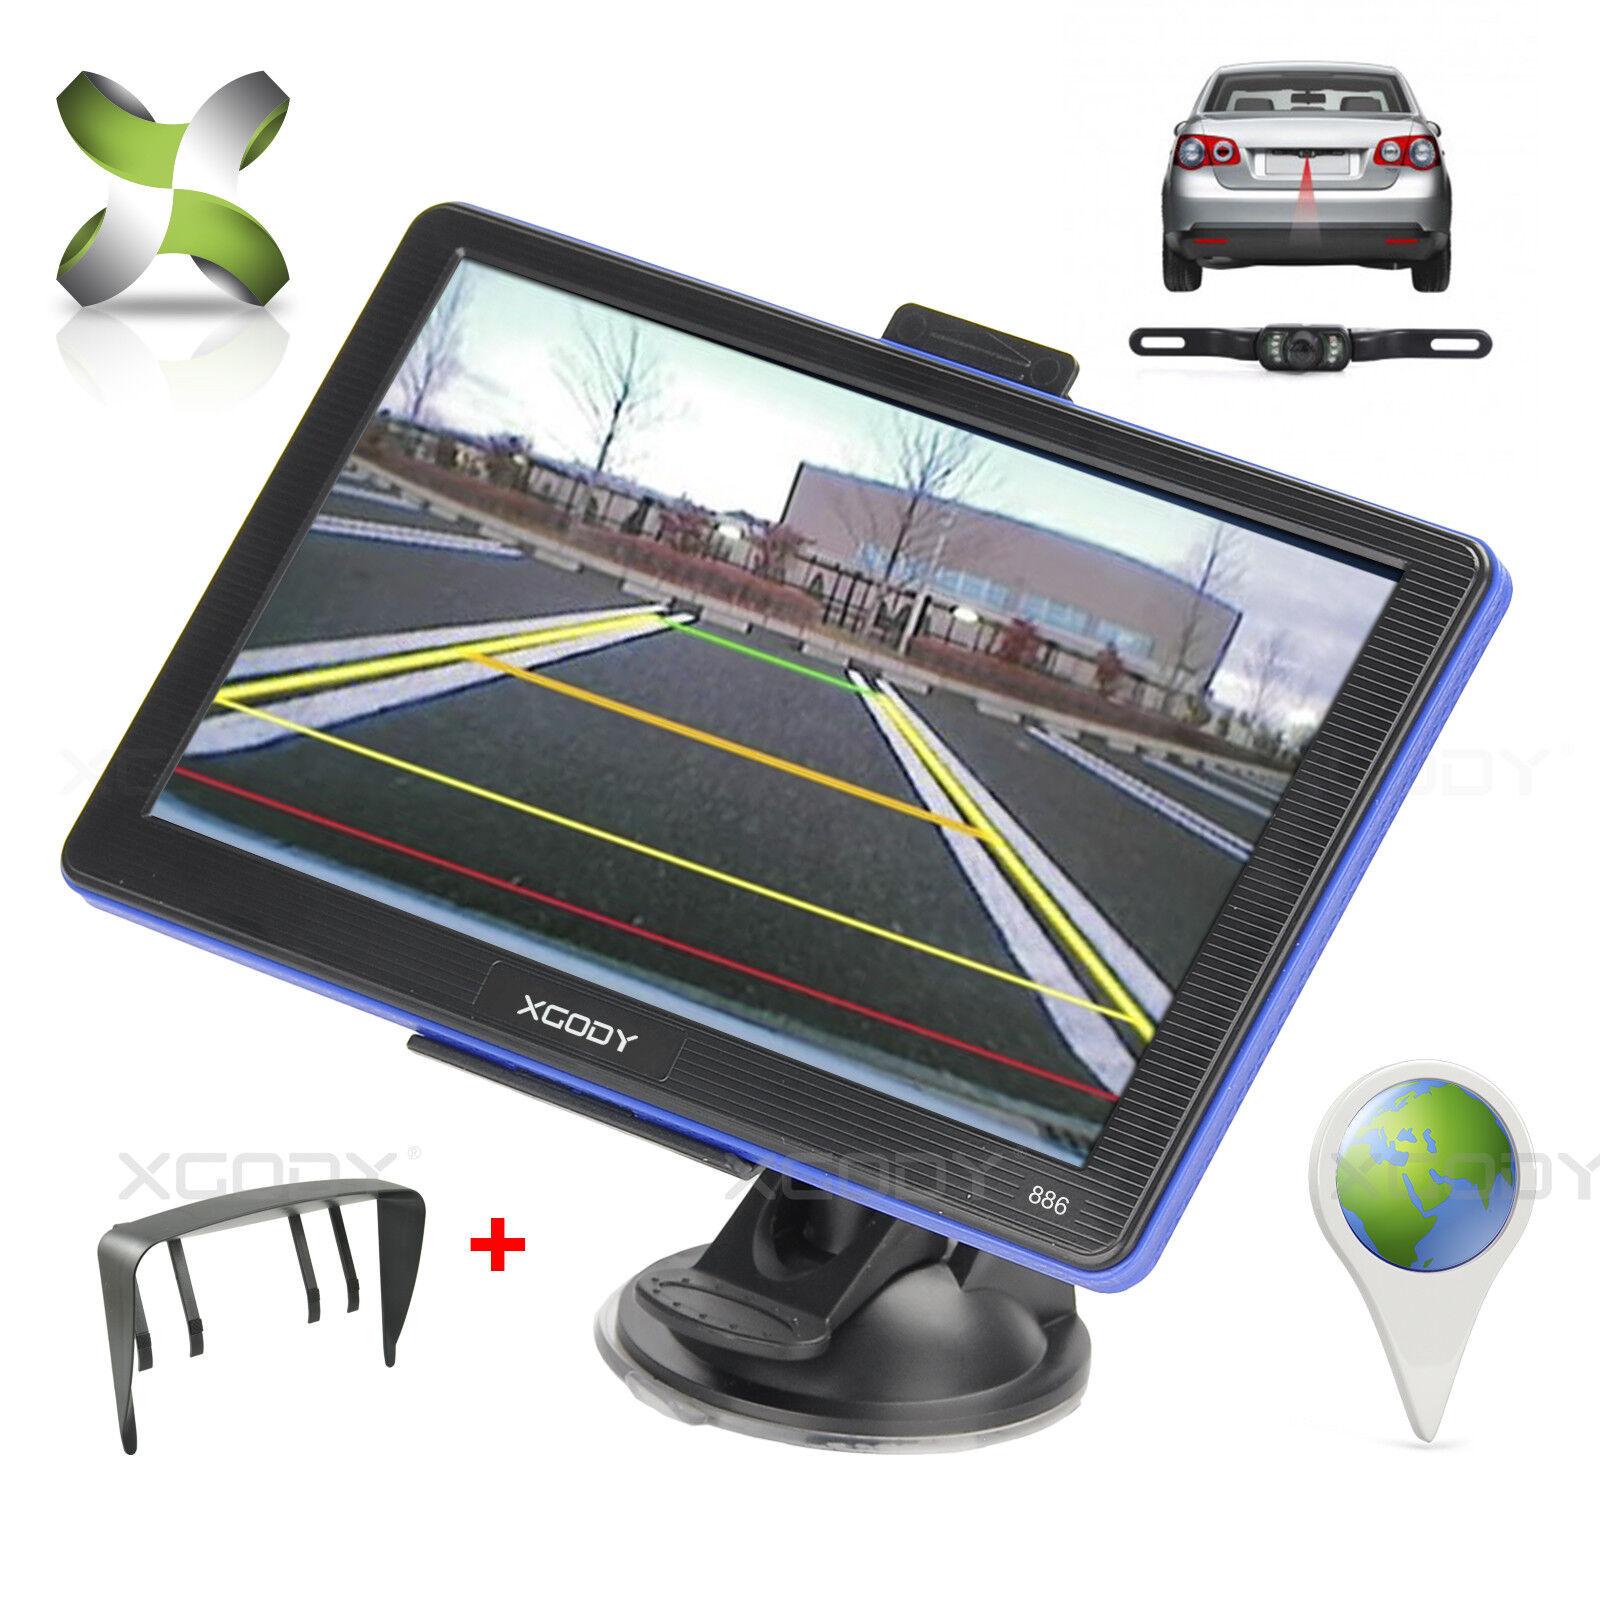 "XGODY 886 7"" GPS Navigation Bluetooth Sat Nav+Reverse"